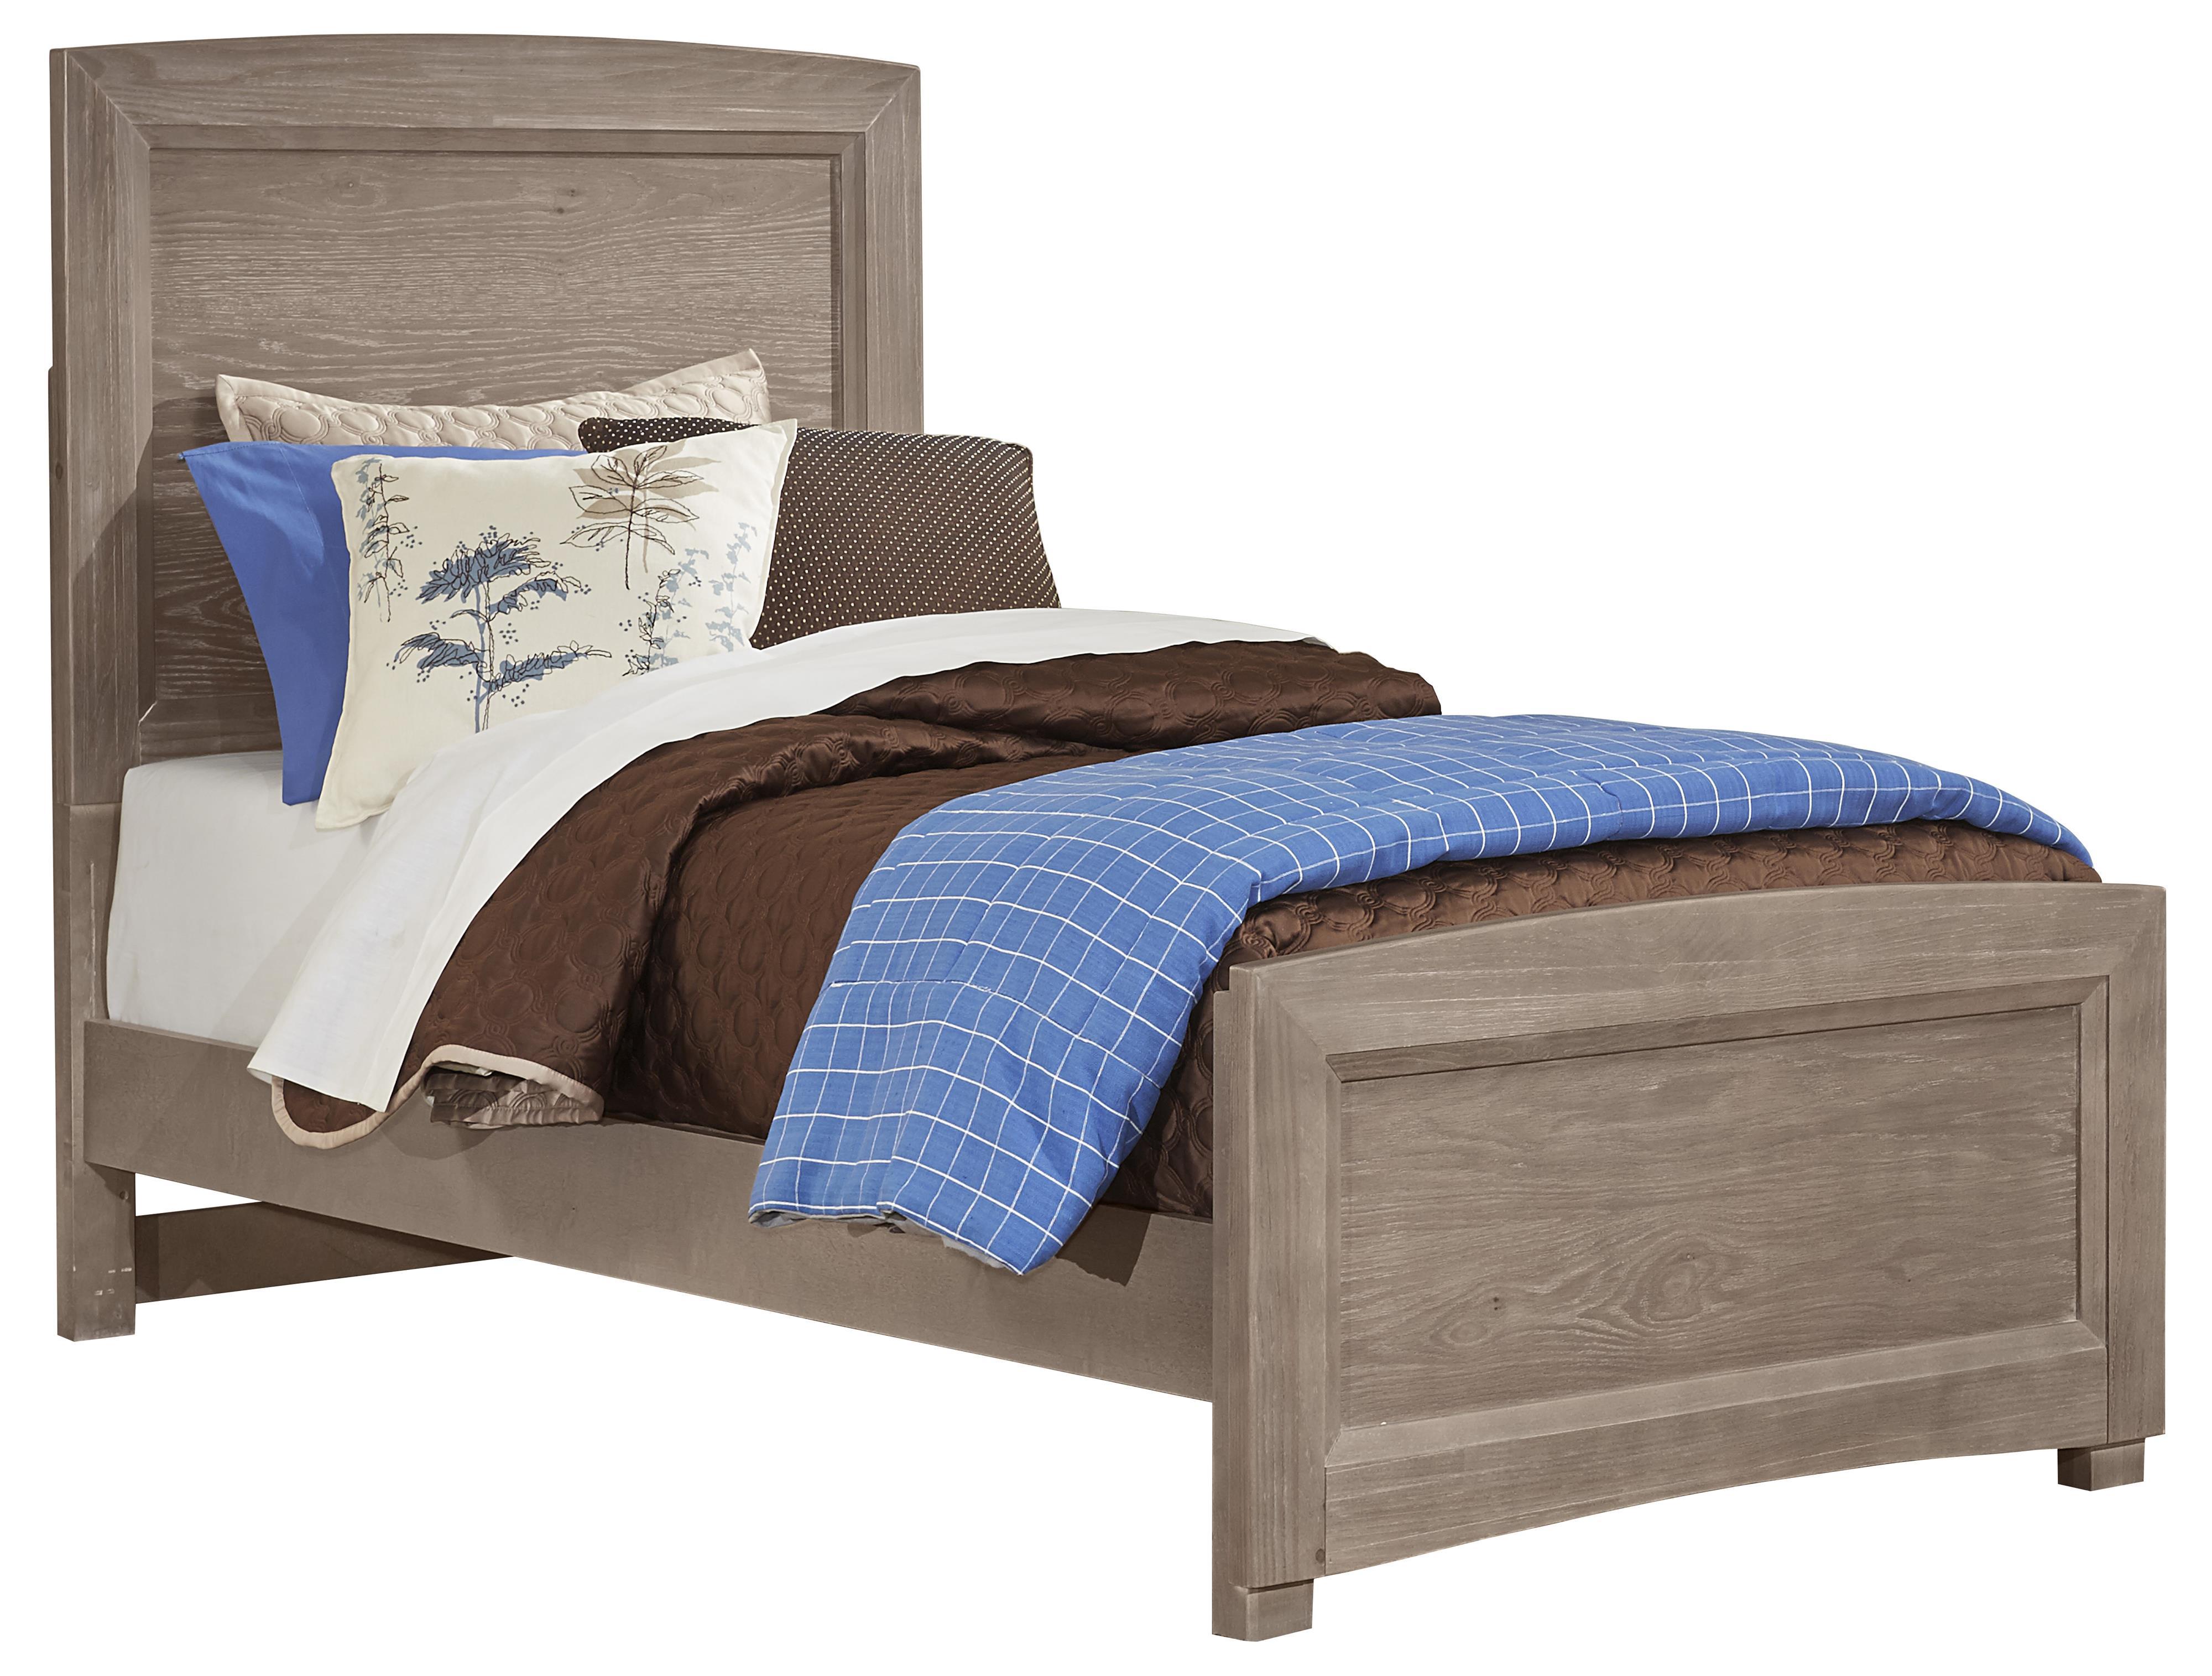 Vaughan bassett transitions twin panel bed mueller for Panel bed mattress